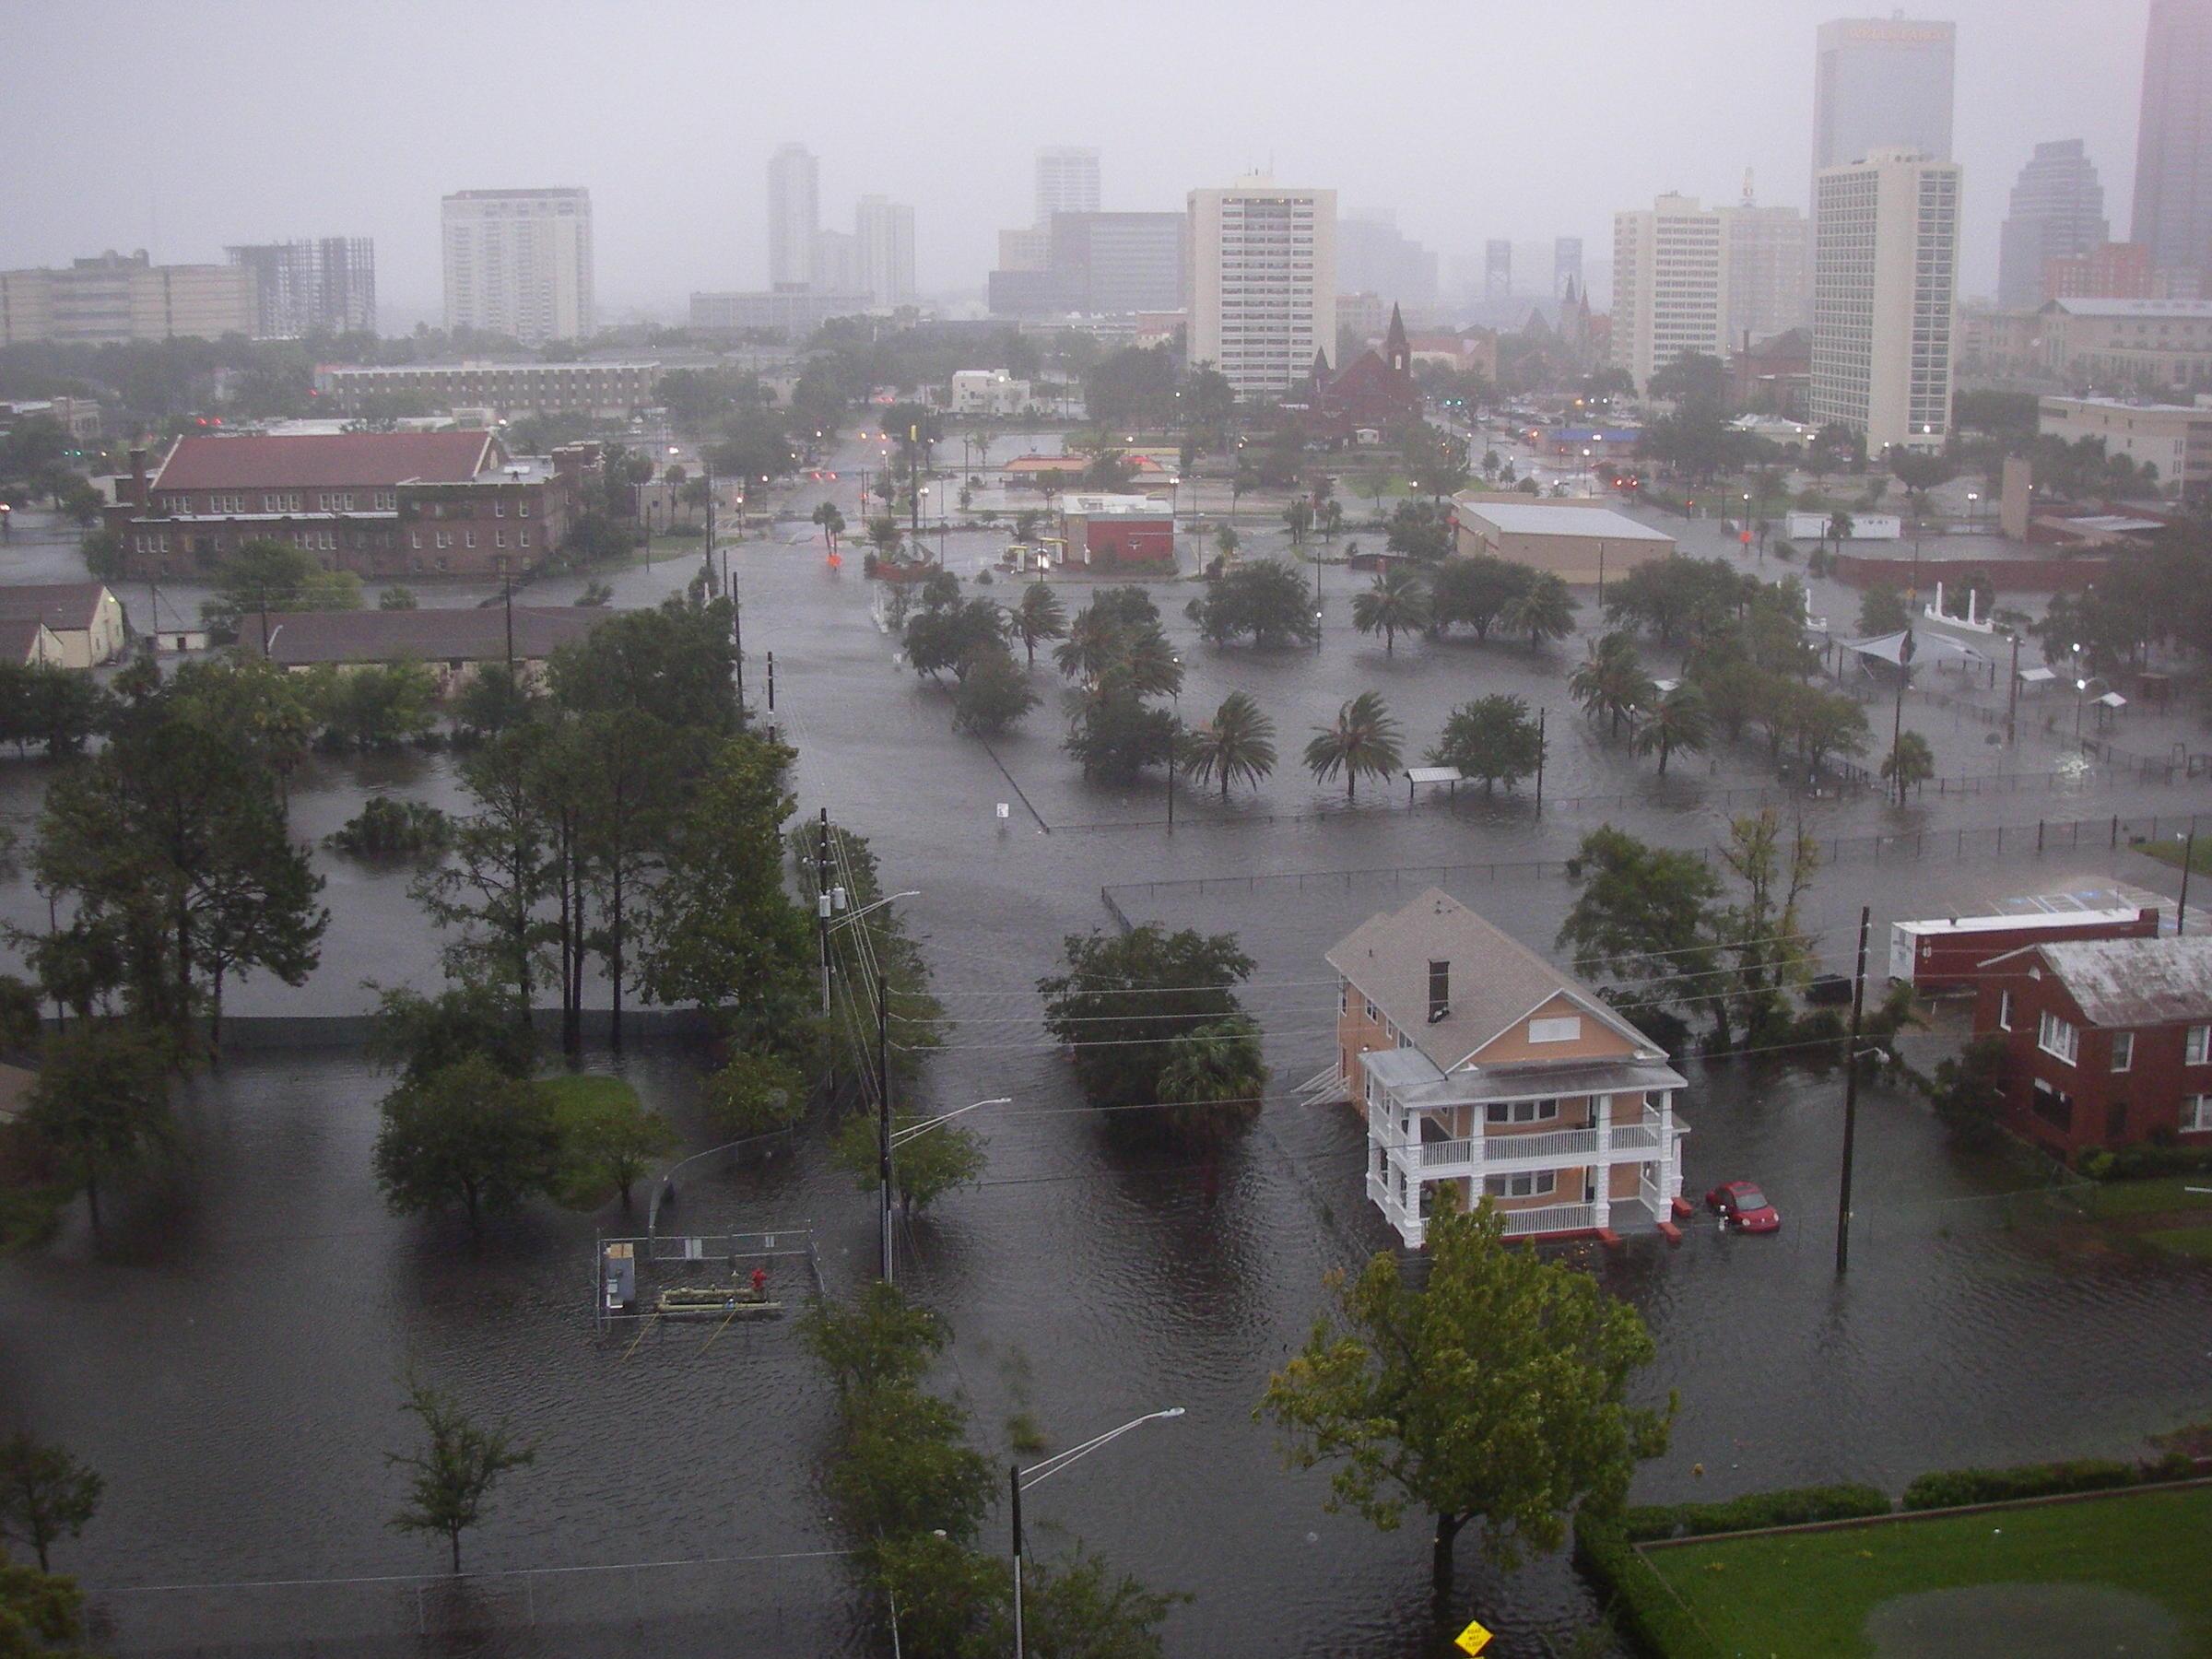 PHOTOS: After Hurricane Irma: Damage, Flooding On Florida ...